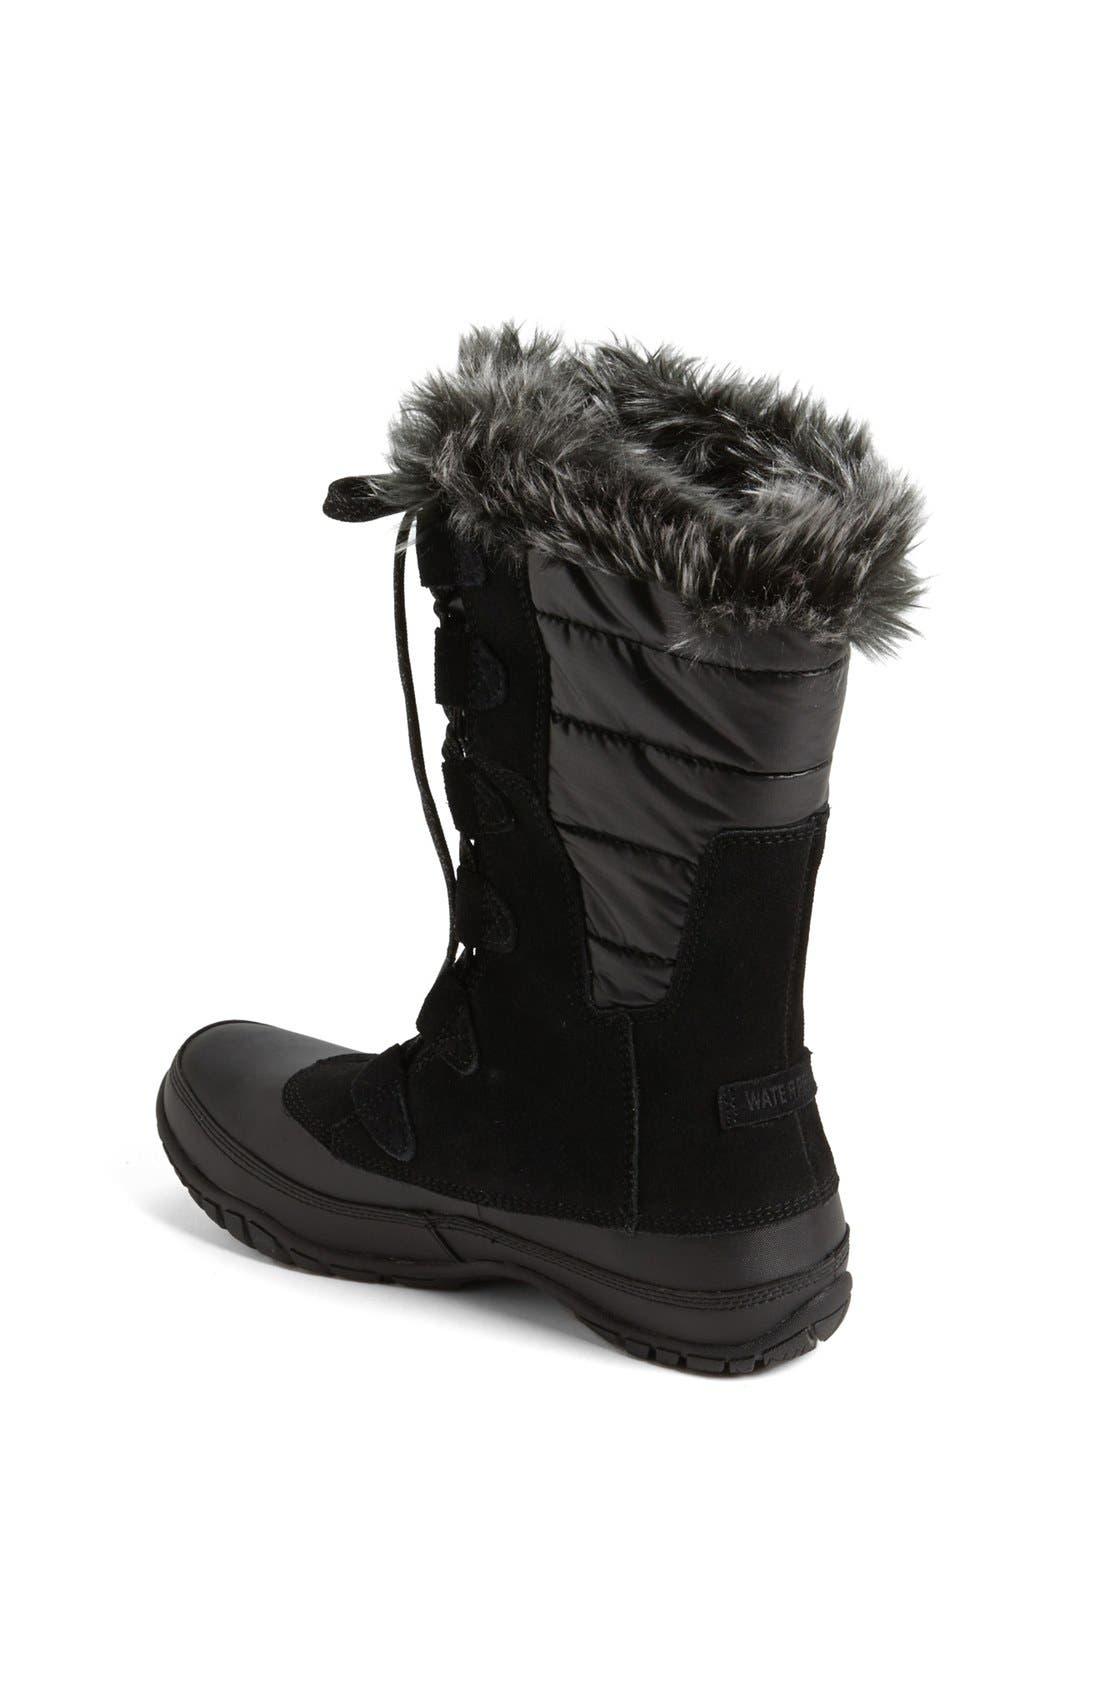 'Nuptse Purna' Waterproof PrimaLoft<sup>®</sup> Eco Insulated Winter Boot,                             Alternate thumbnail 2, color,                             001